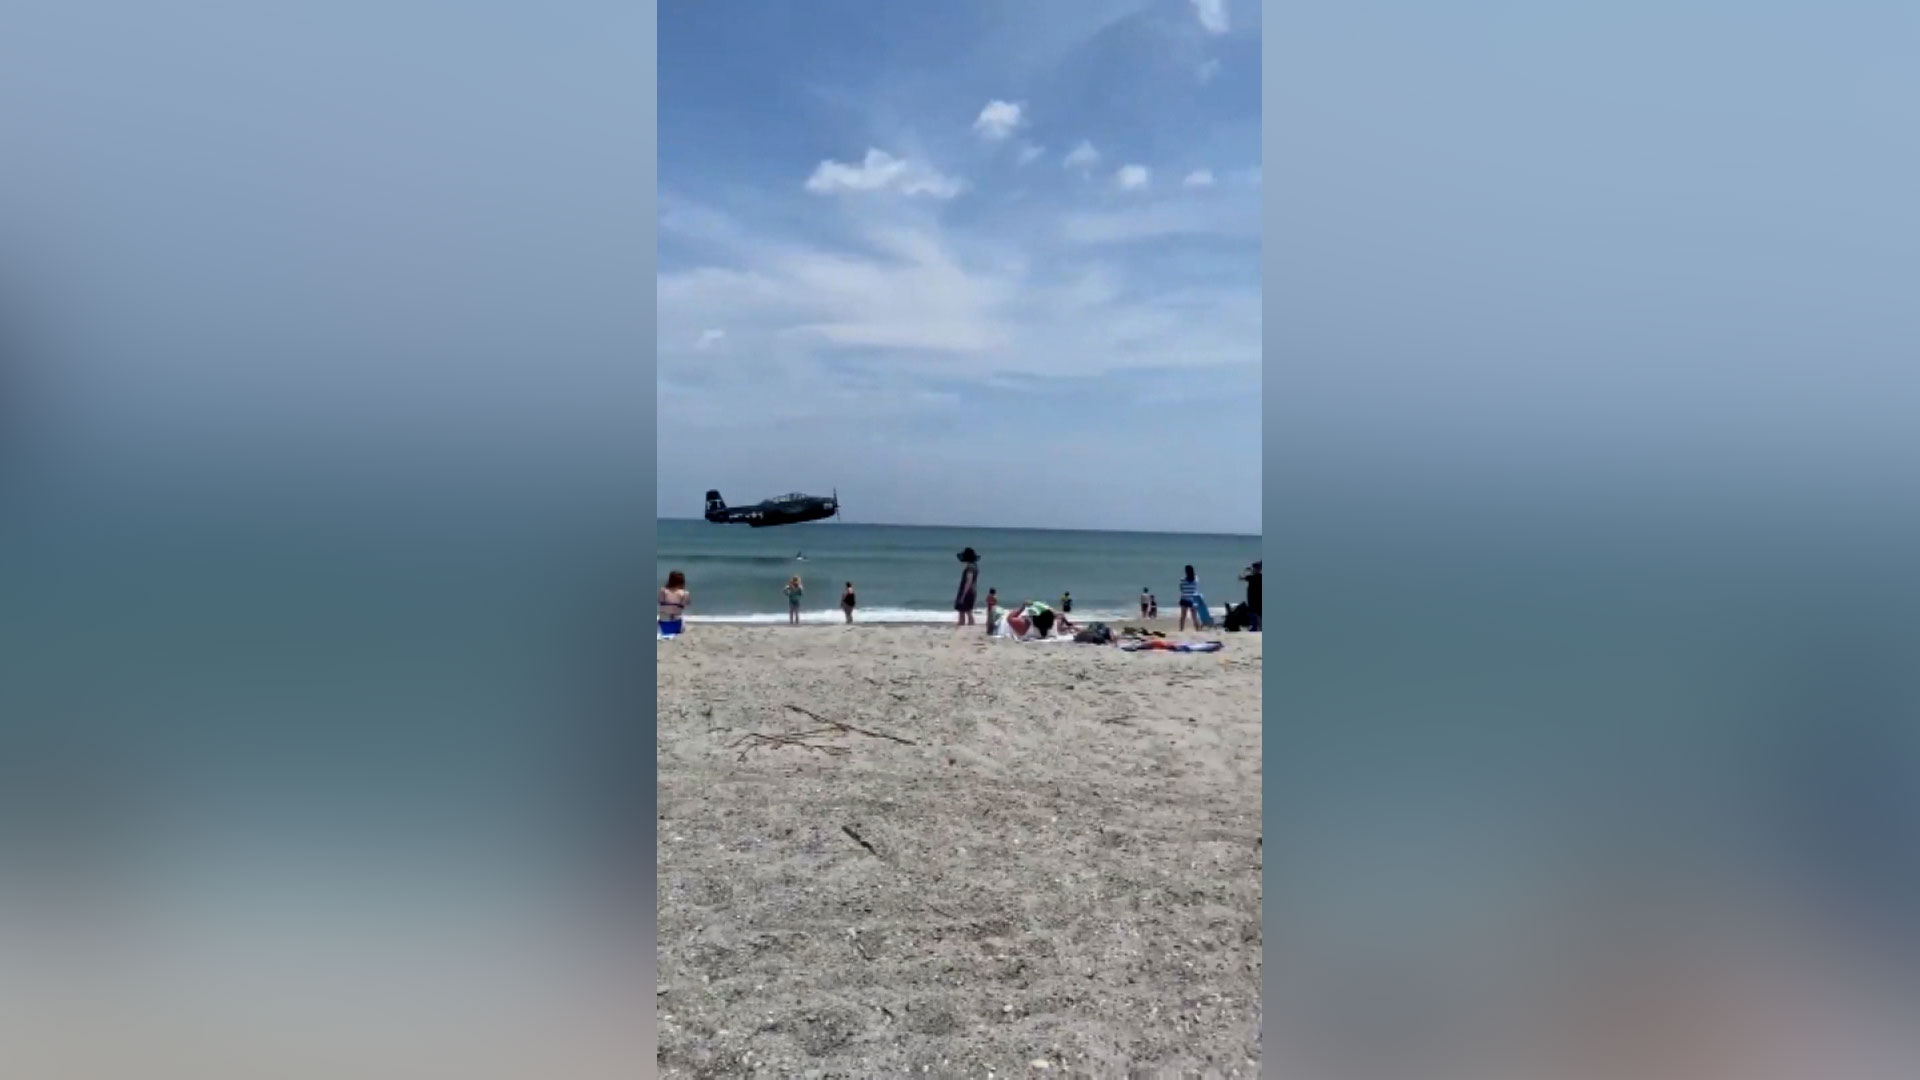 WWII era plane makes emergency landing near Florida beach